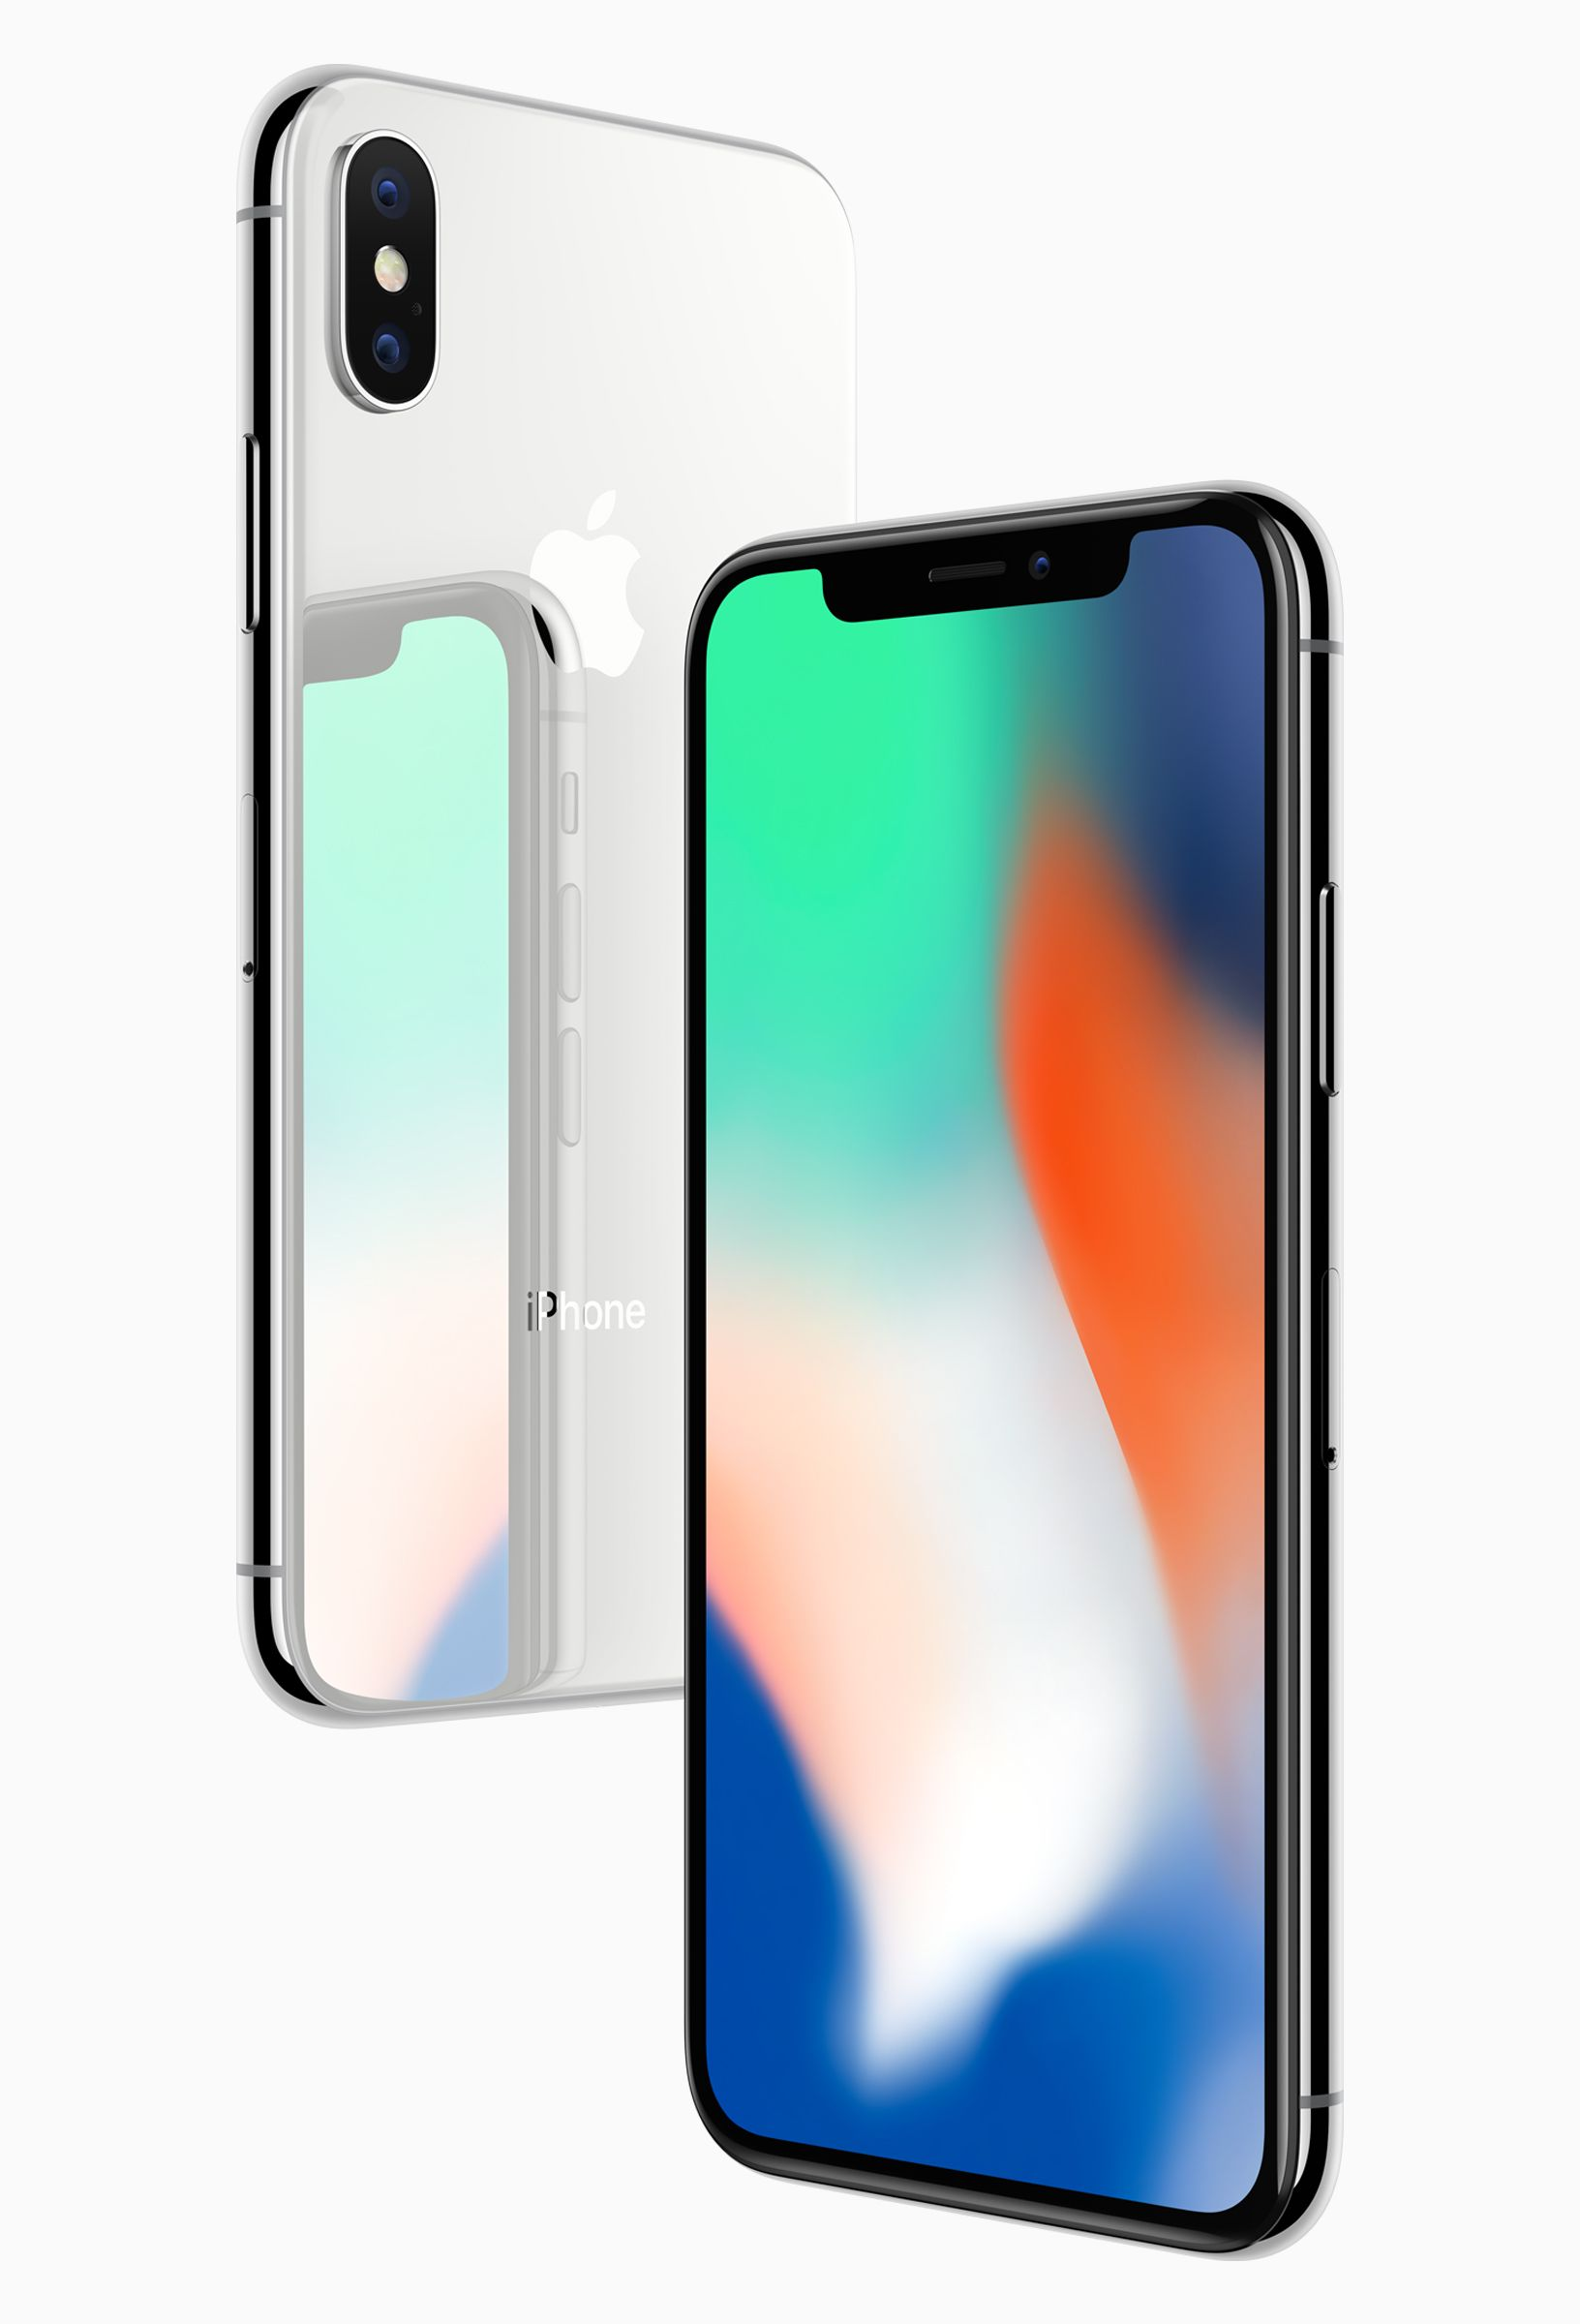 Apple เป ดต ว Iphone X Iphone 8 และ Iphone 8 Plus สมาร ทโฟน โทรศ พท เทคโนโลย